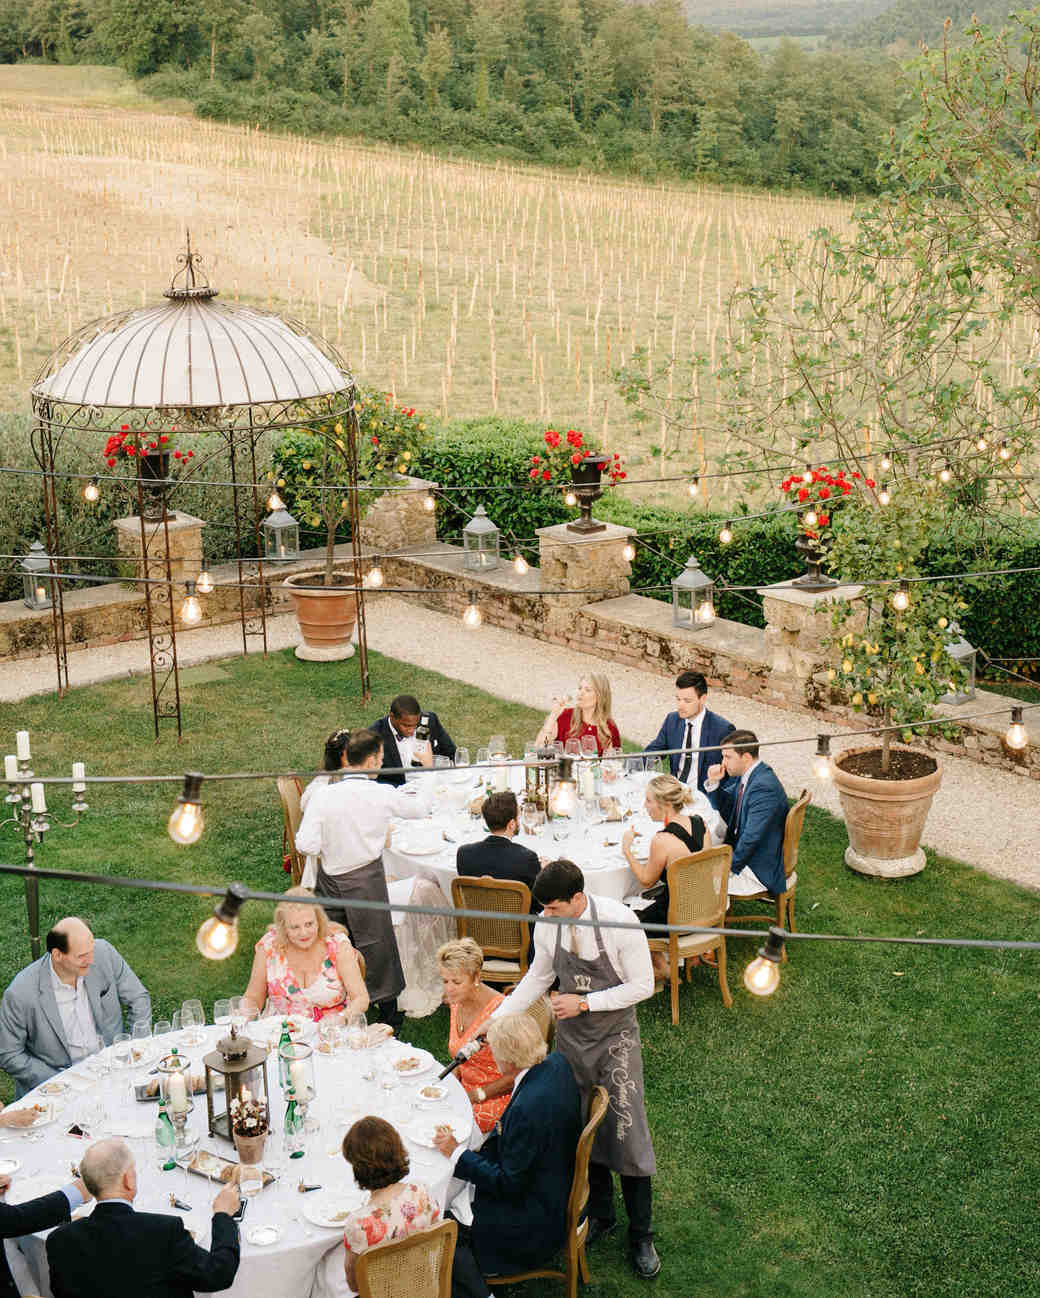 alexis zach wedding italy reception